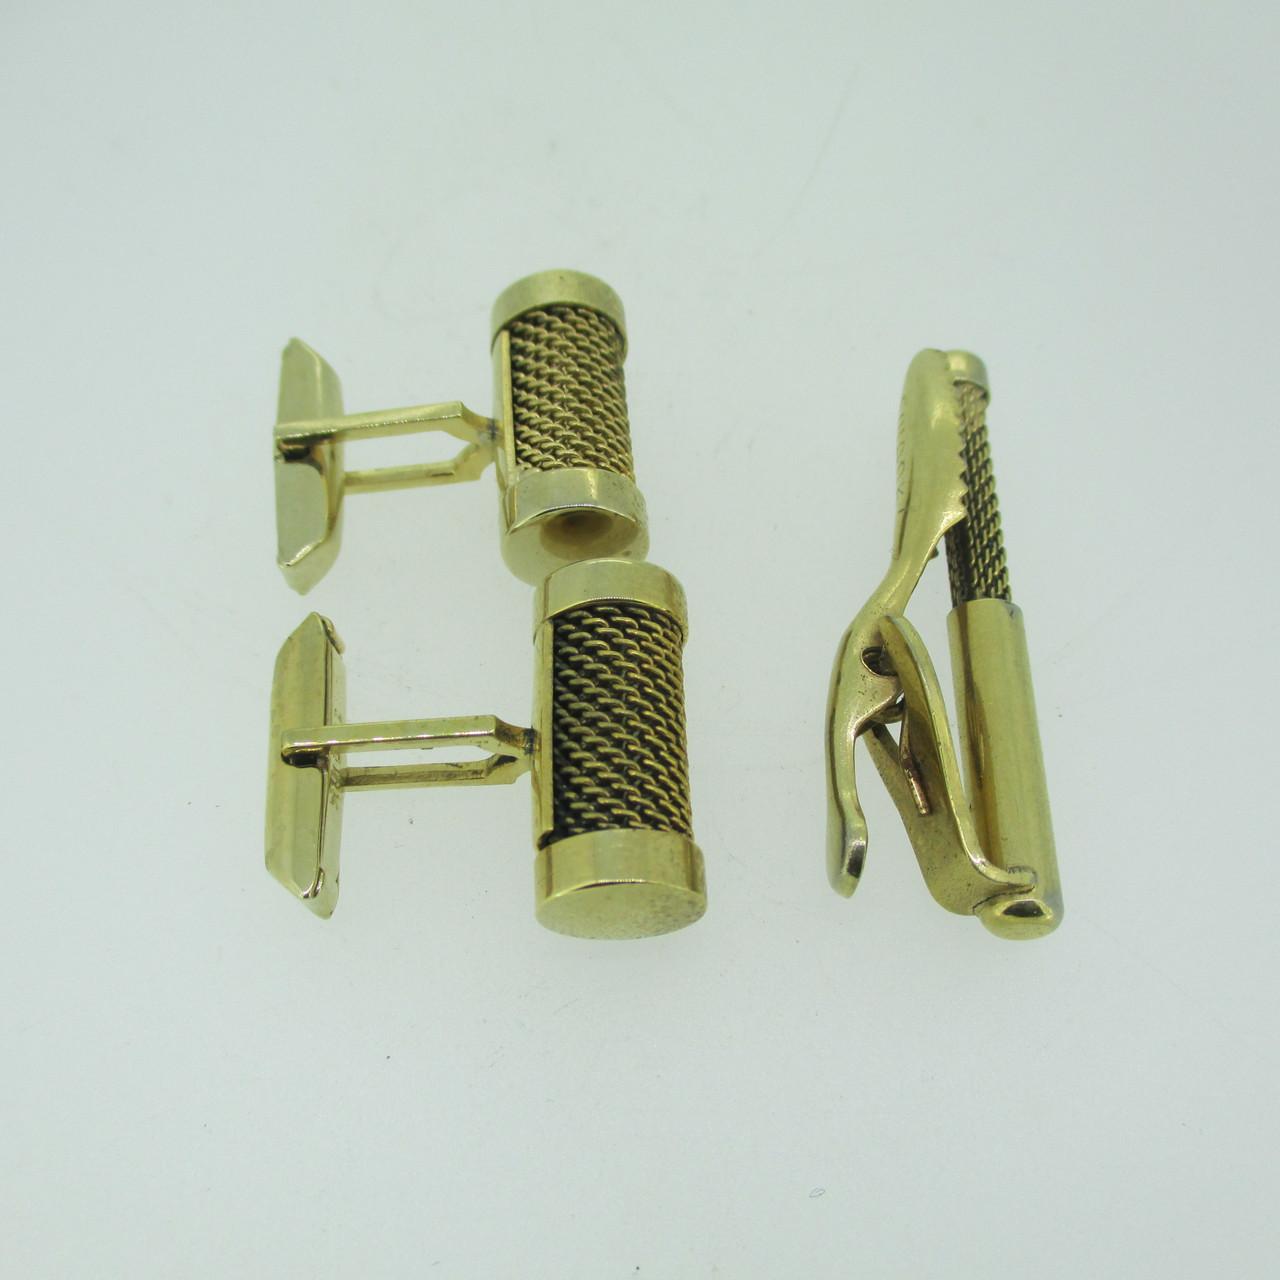 Mesh Clip Cuff Links Vintage Cufflinks Gold toned w Green Rhinestones